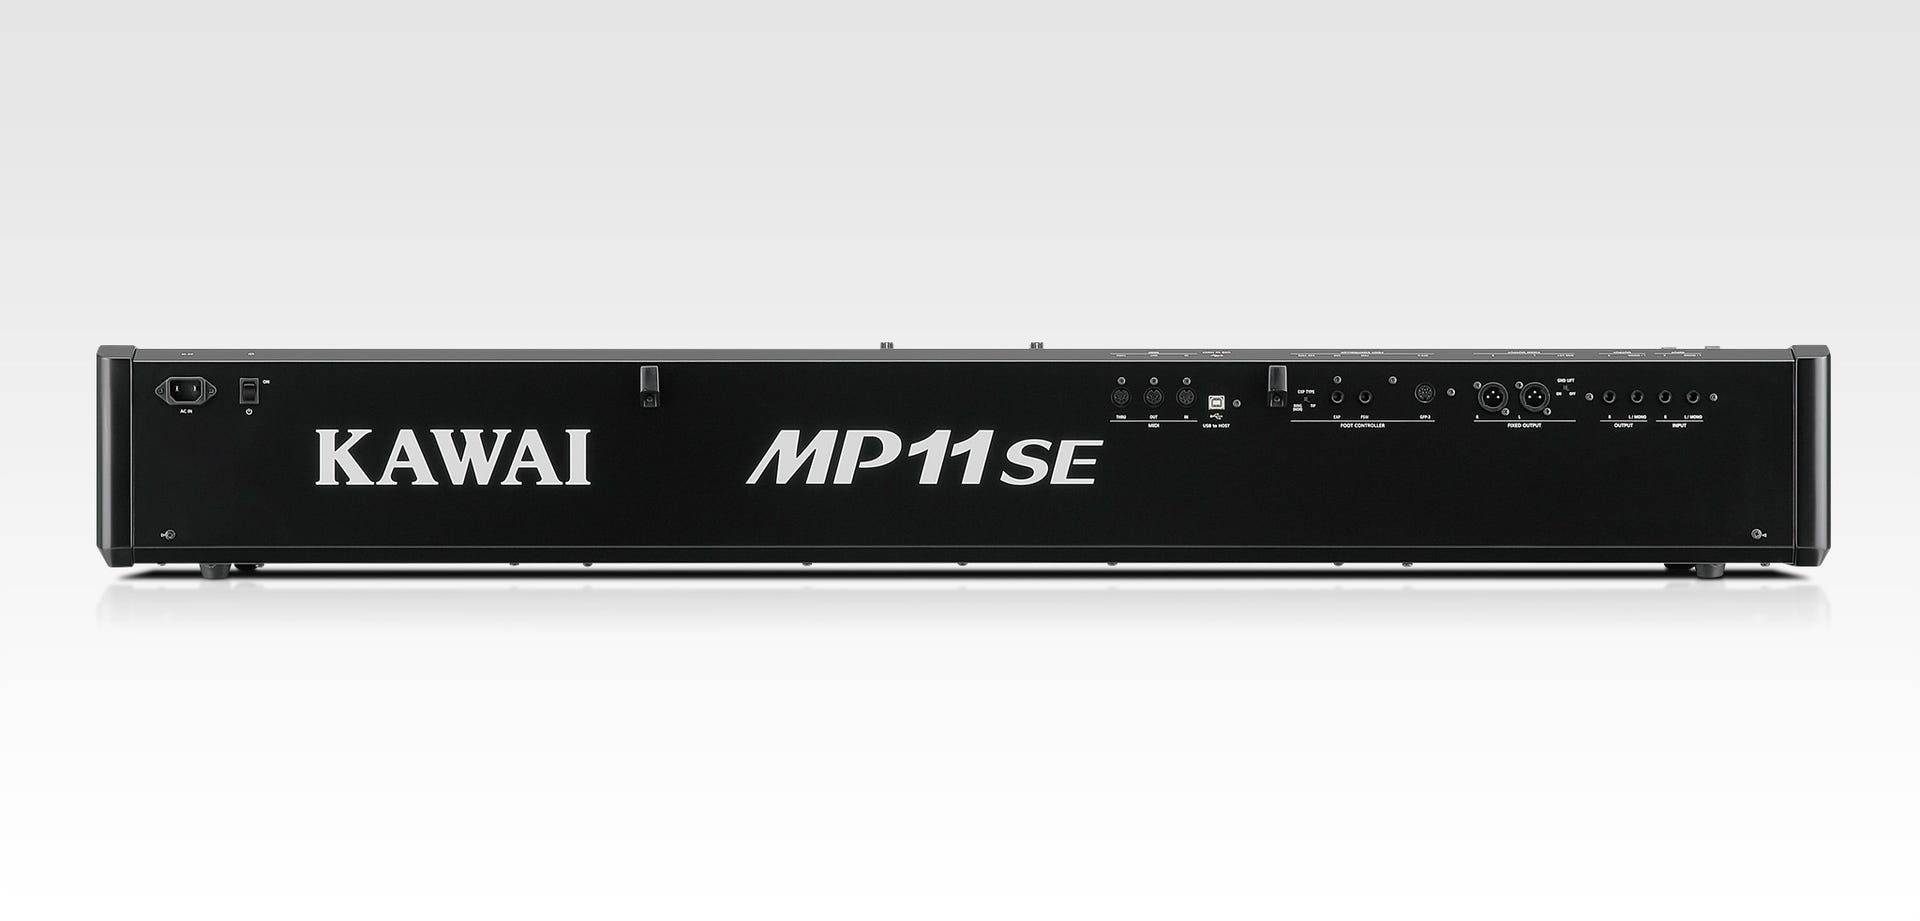 Kawai MP11SE Digital Stage Piano (MP-11SE)